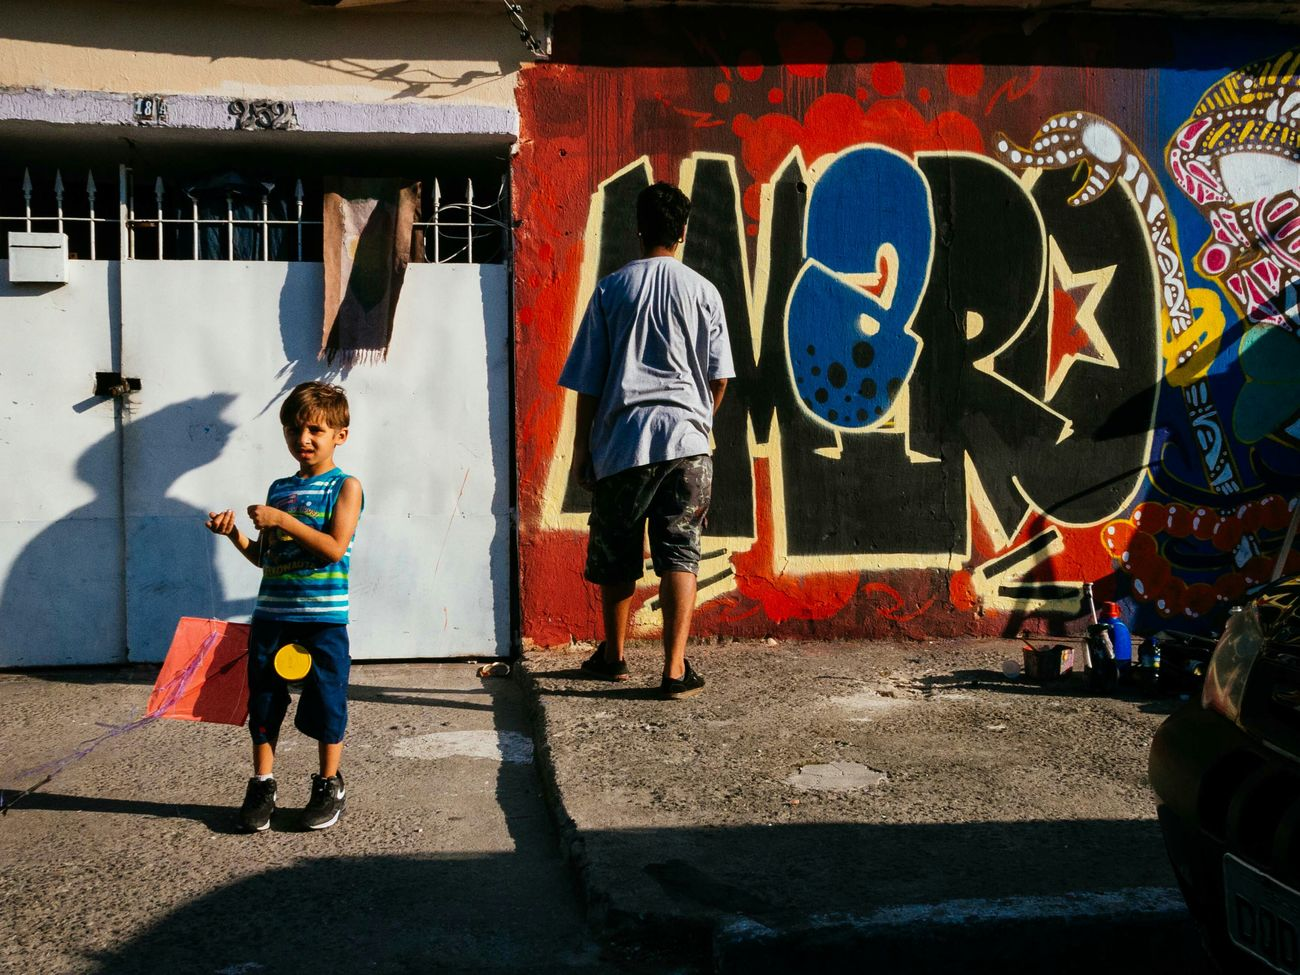 Embrace Urban Life Streetphotography Colors EyeEm Fotografia De Rua São Paulo EyeEm Best Shots